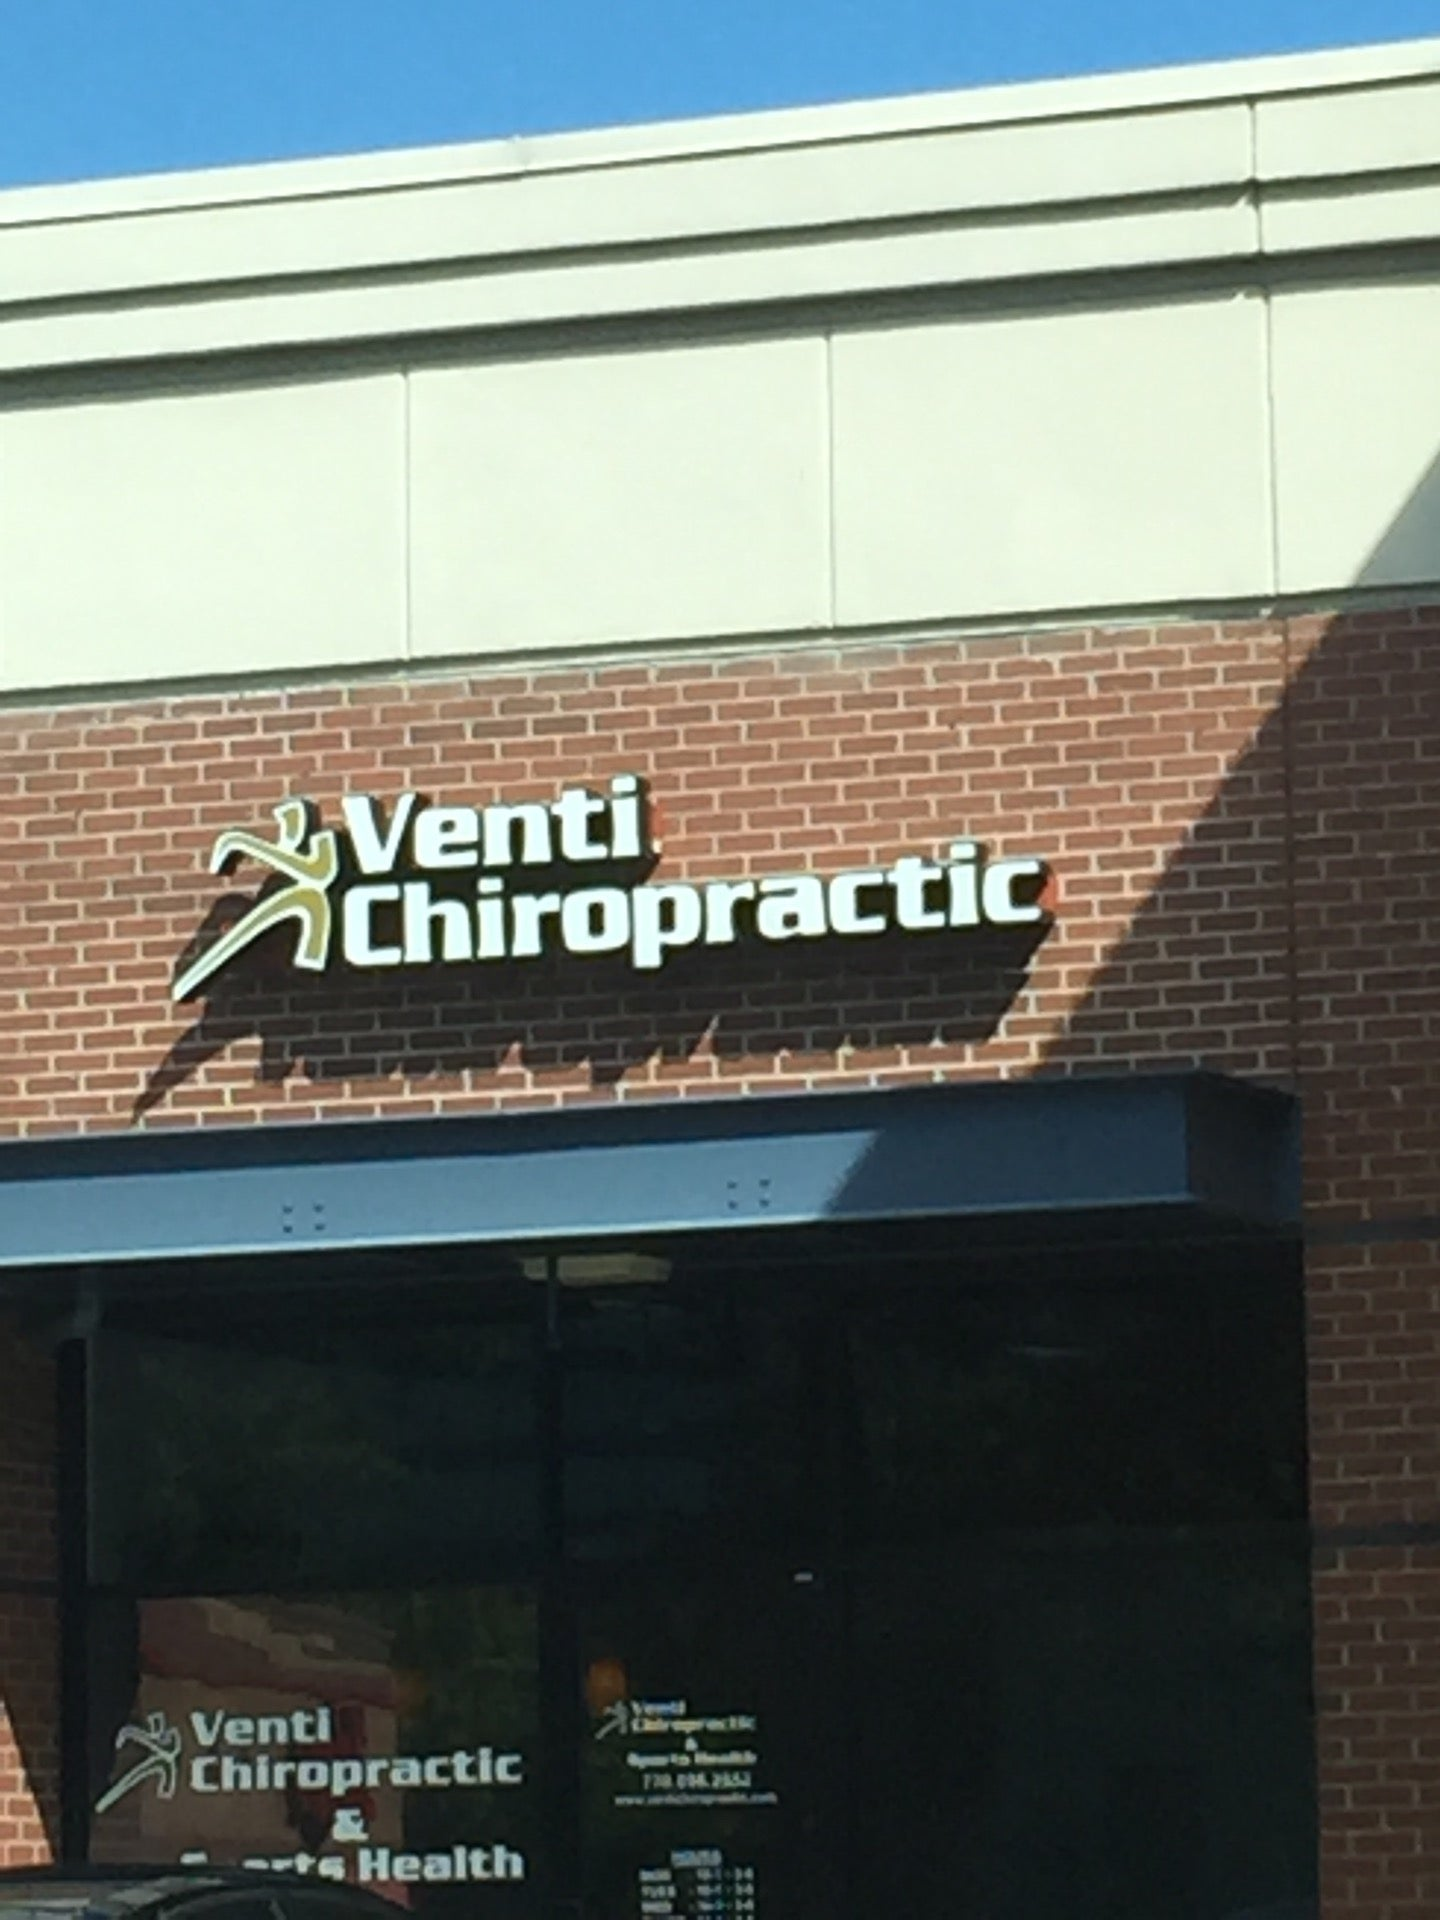 Venti Chiropractic,